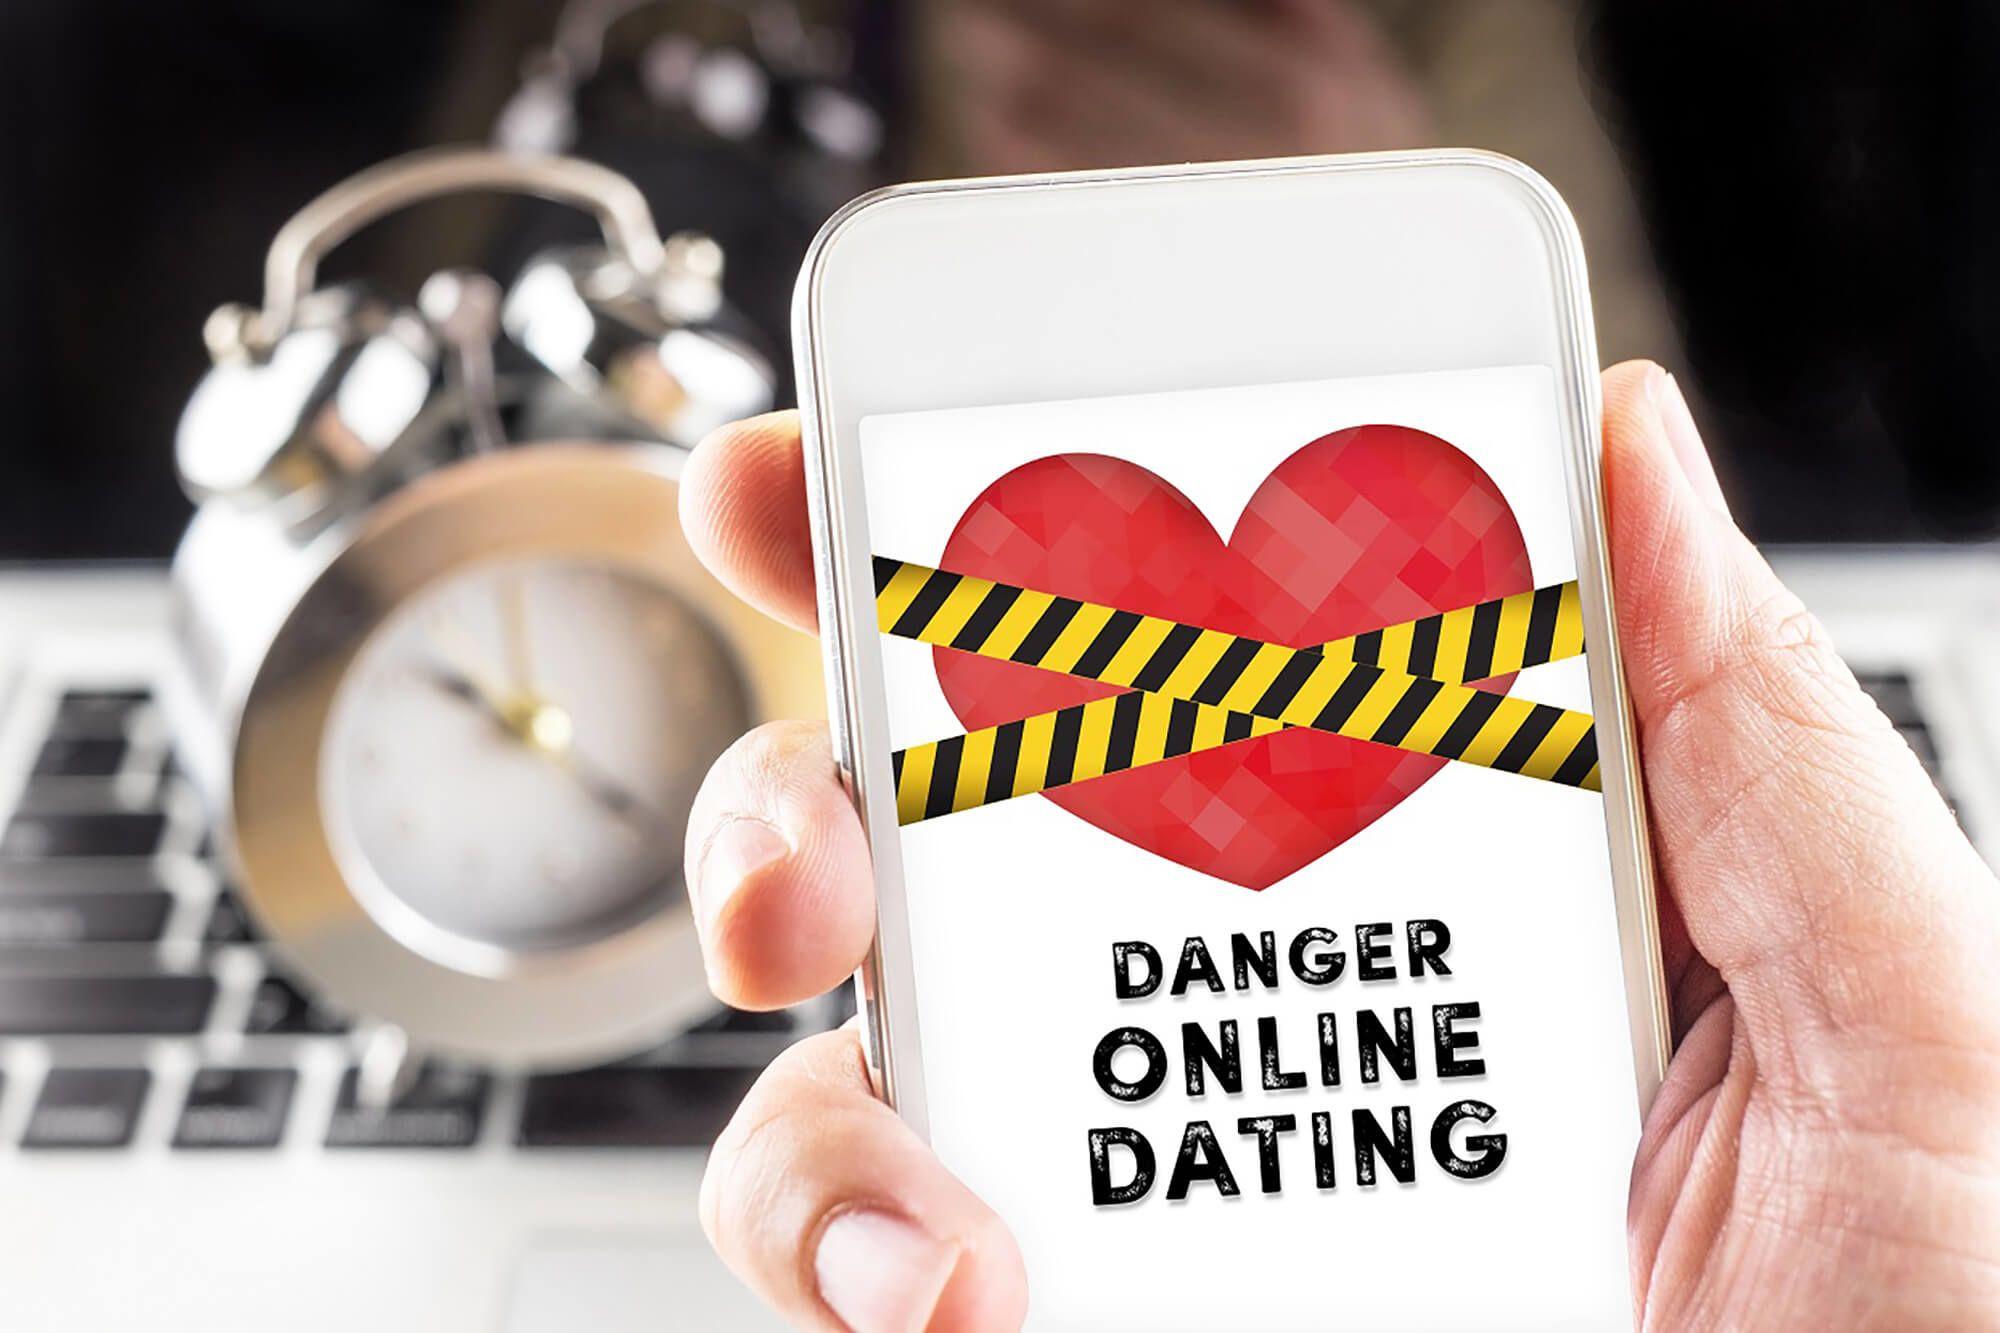 Alarmstufe Rot beim Flirten: Romance Scamming